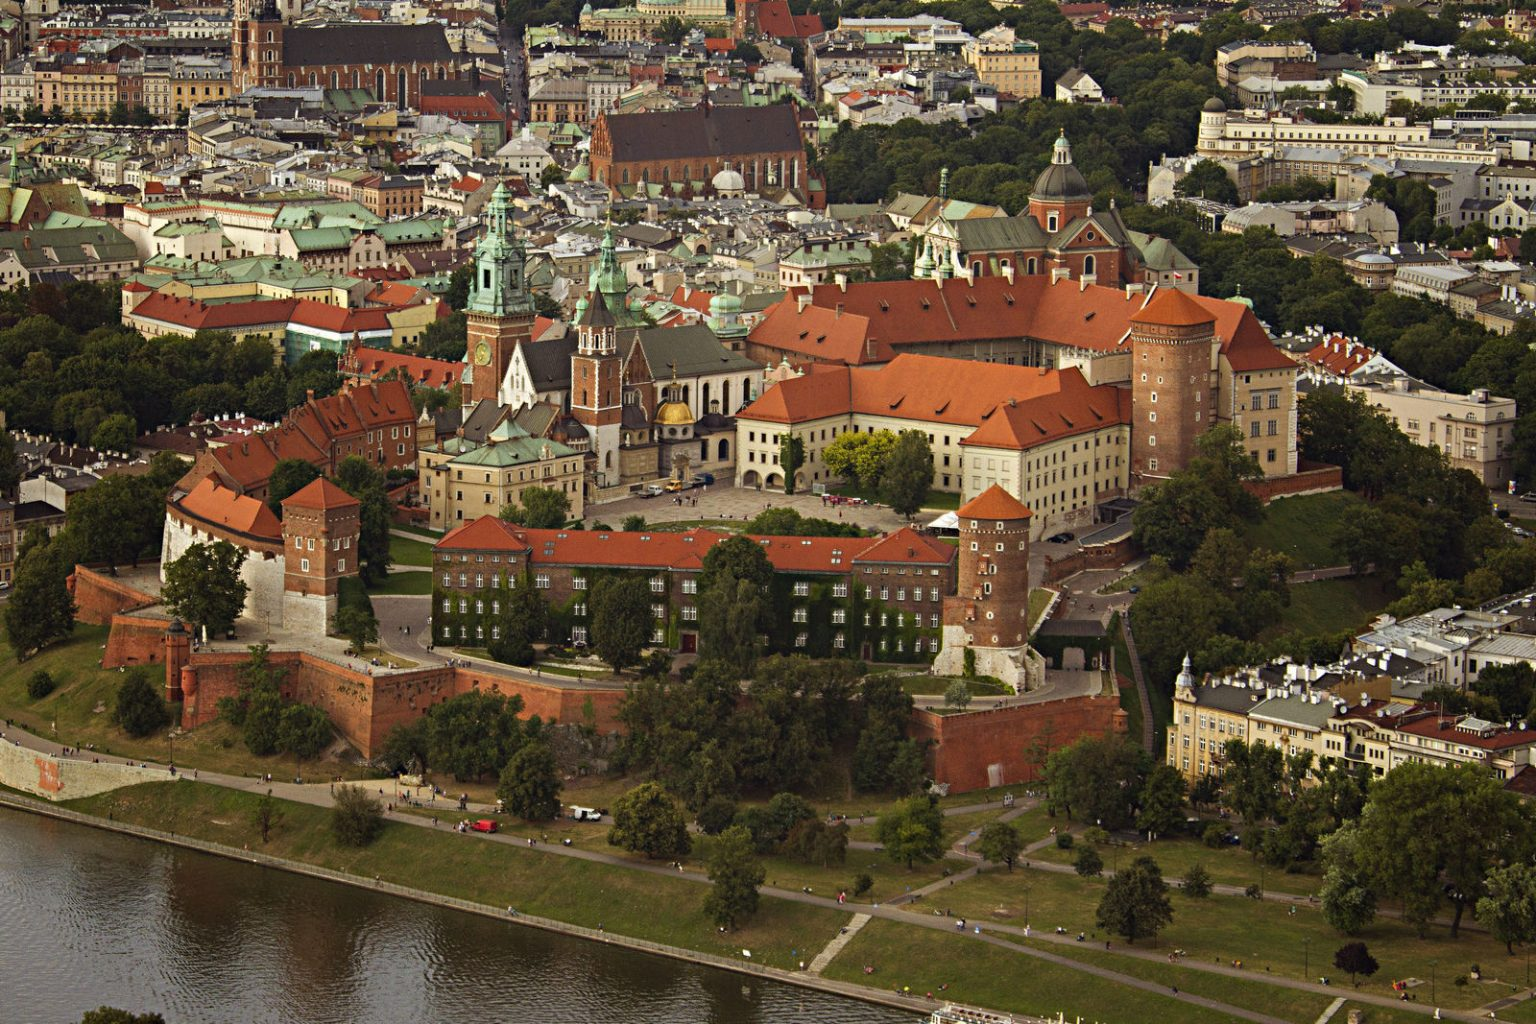 wawel hill and castle in krakkow poland